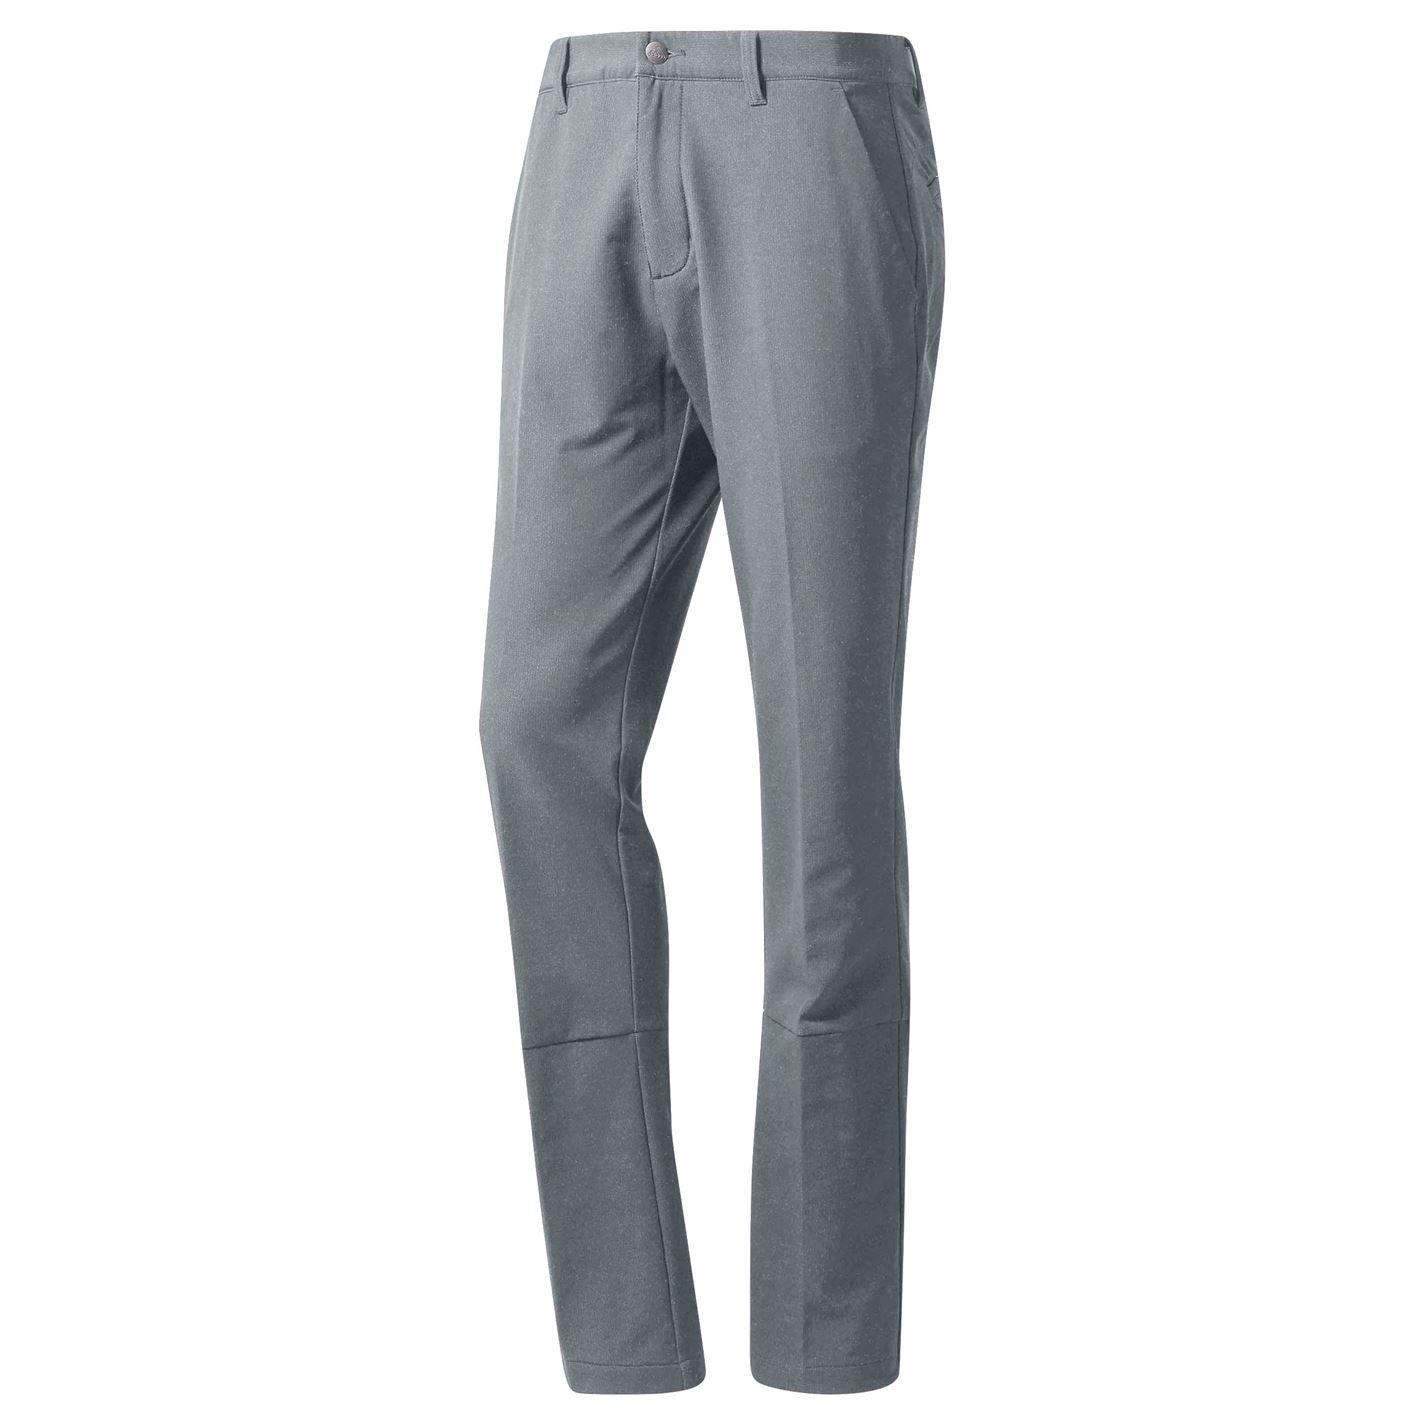 adidas FrostGrd Pant Sn84